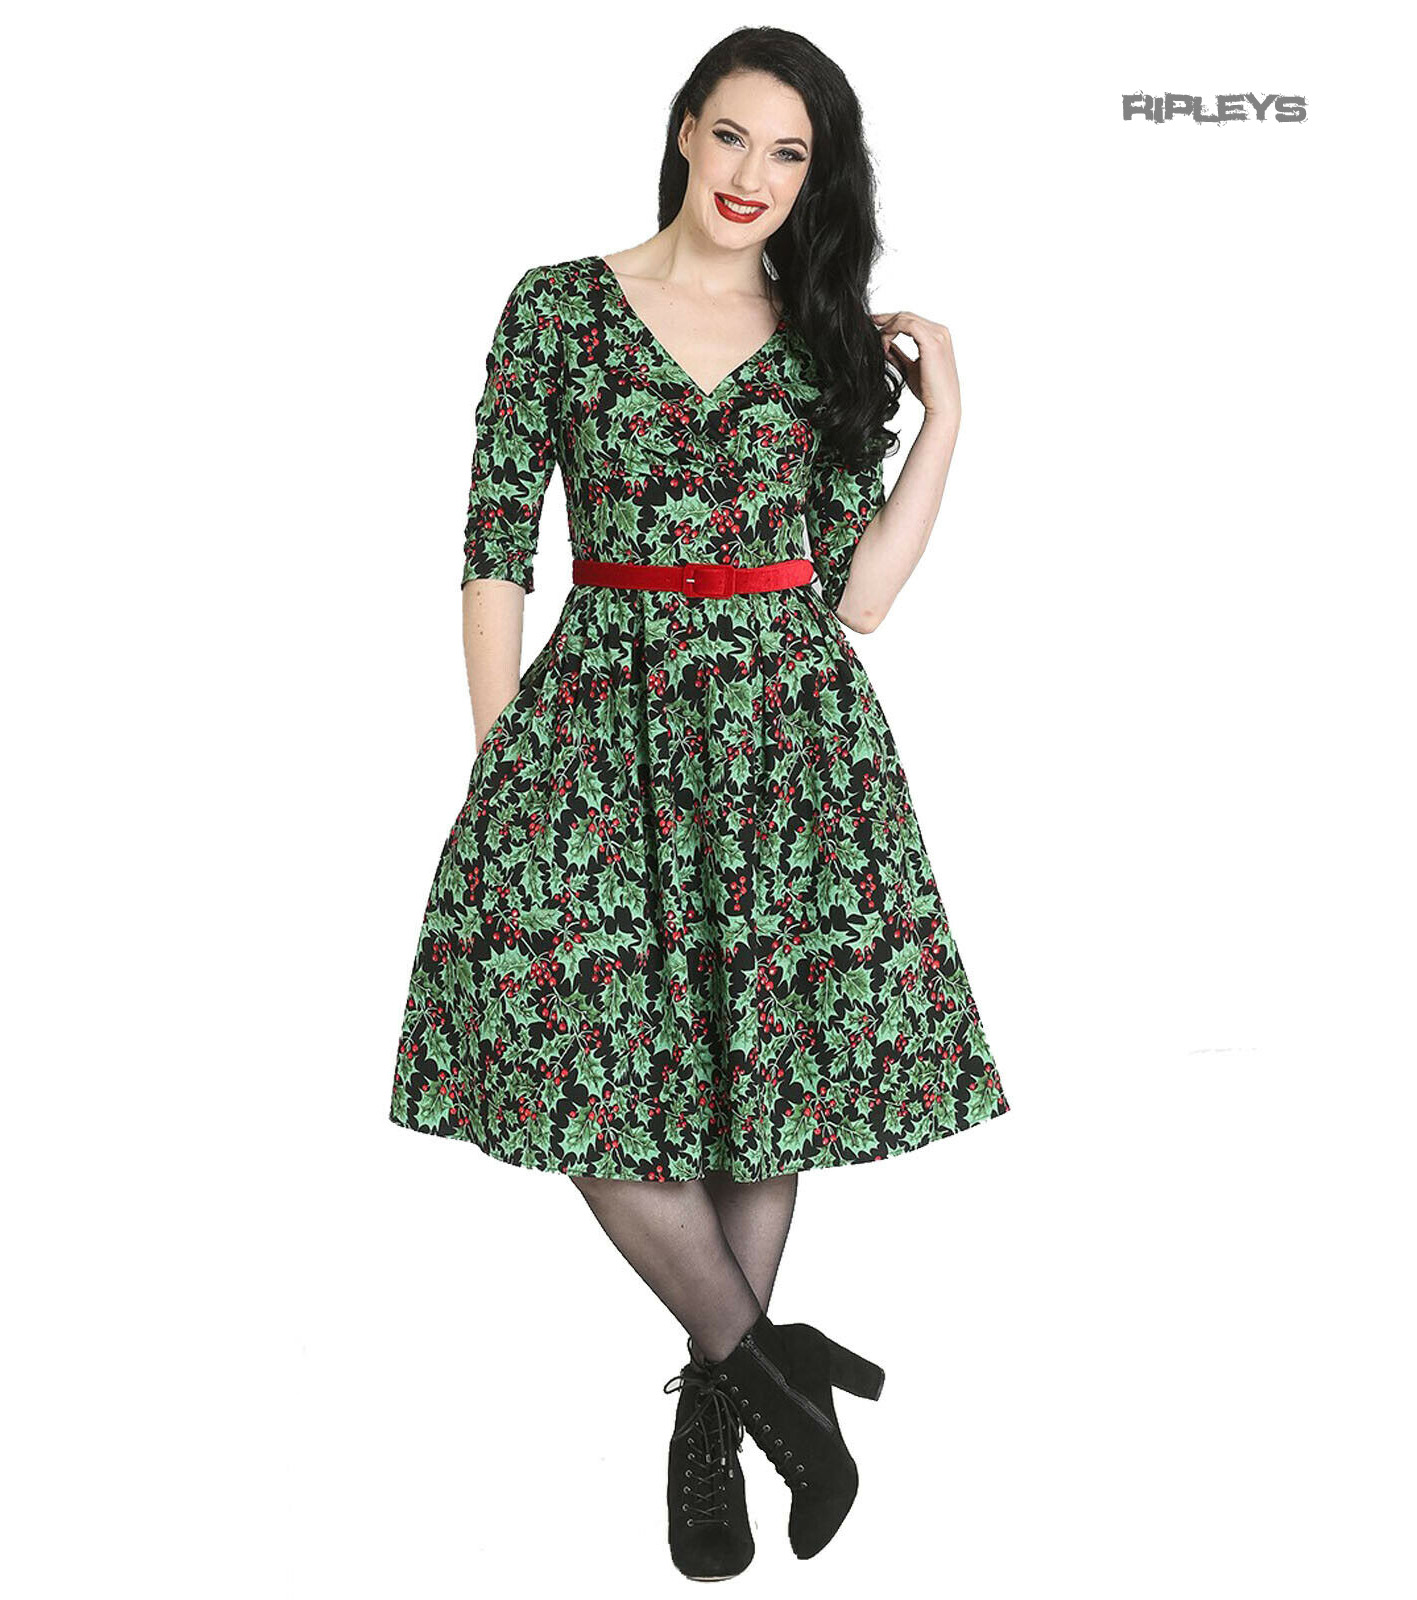 Hell-Bunny-50s-Pin-Up-Navidad-Vestido-Festivo-Rojo-Holly-Berry-Negro-Todos-los-Tamanos miniatura 30